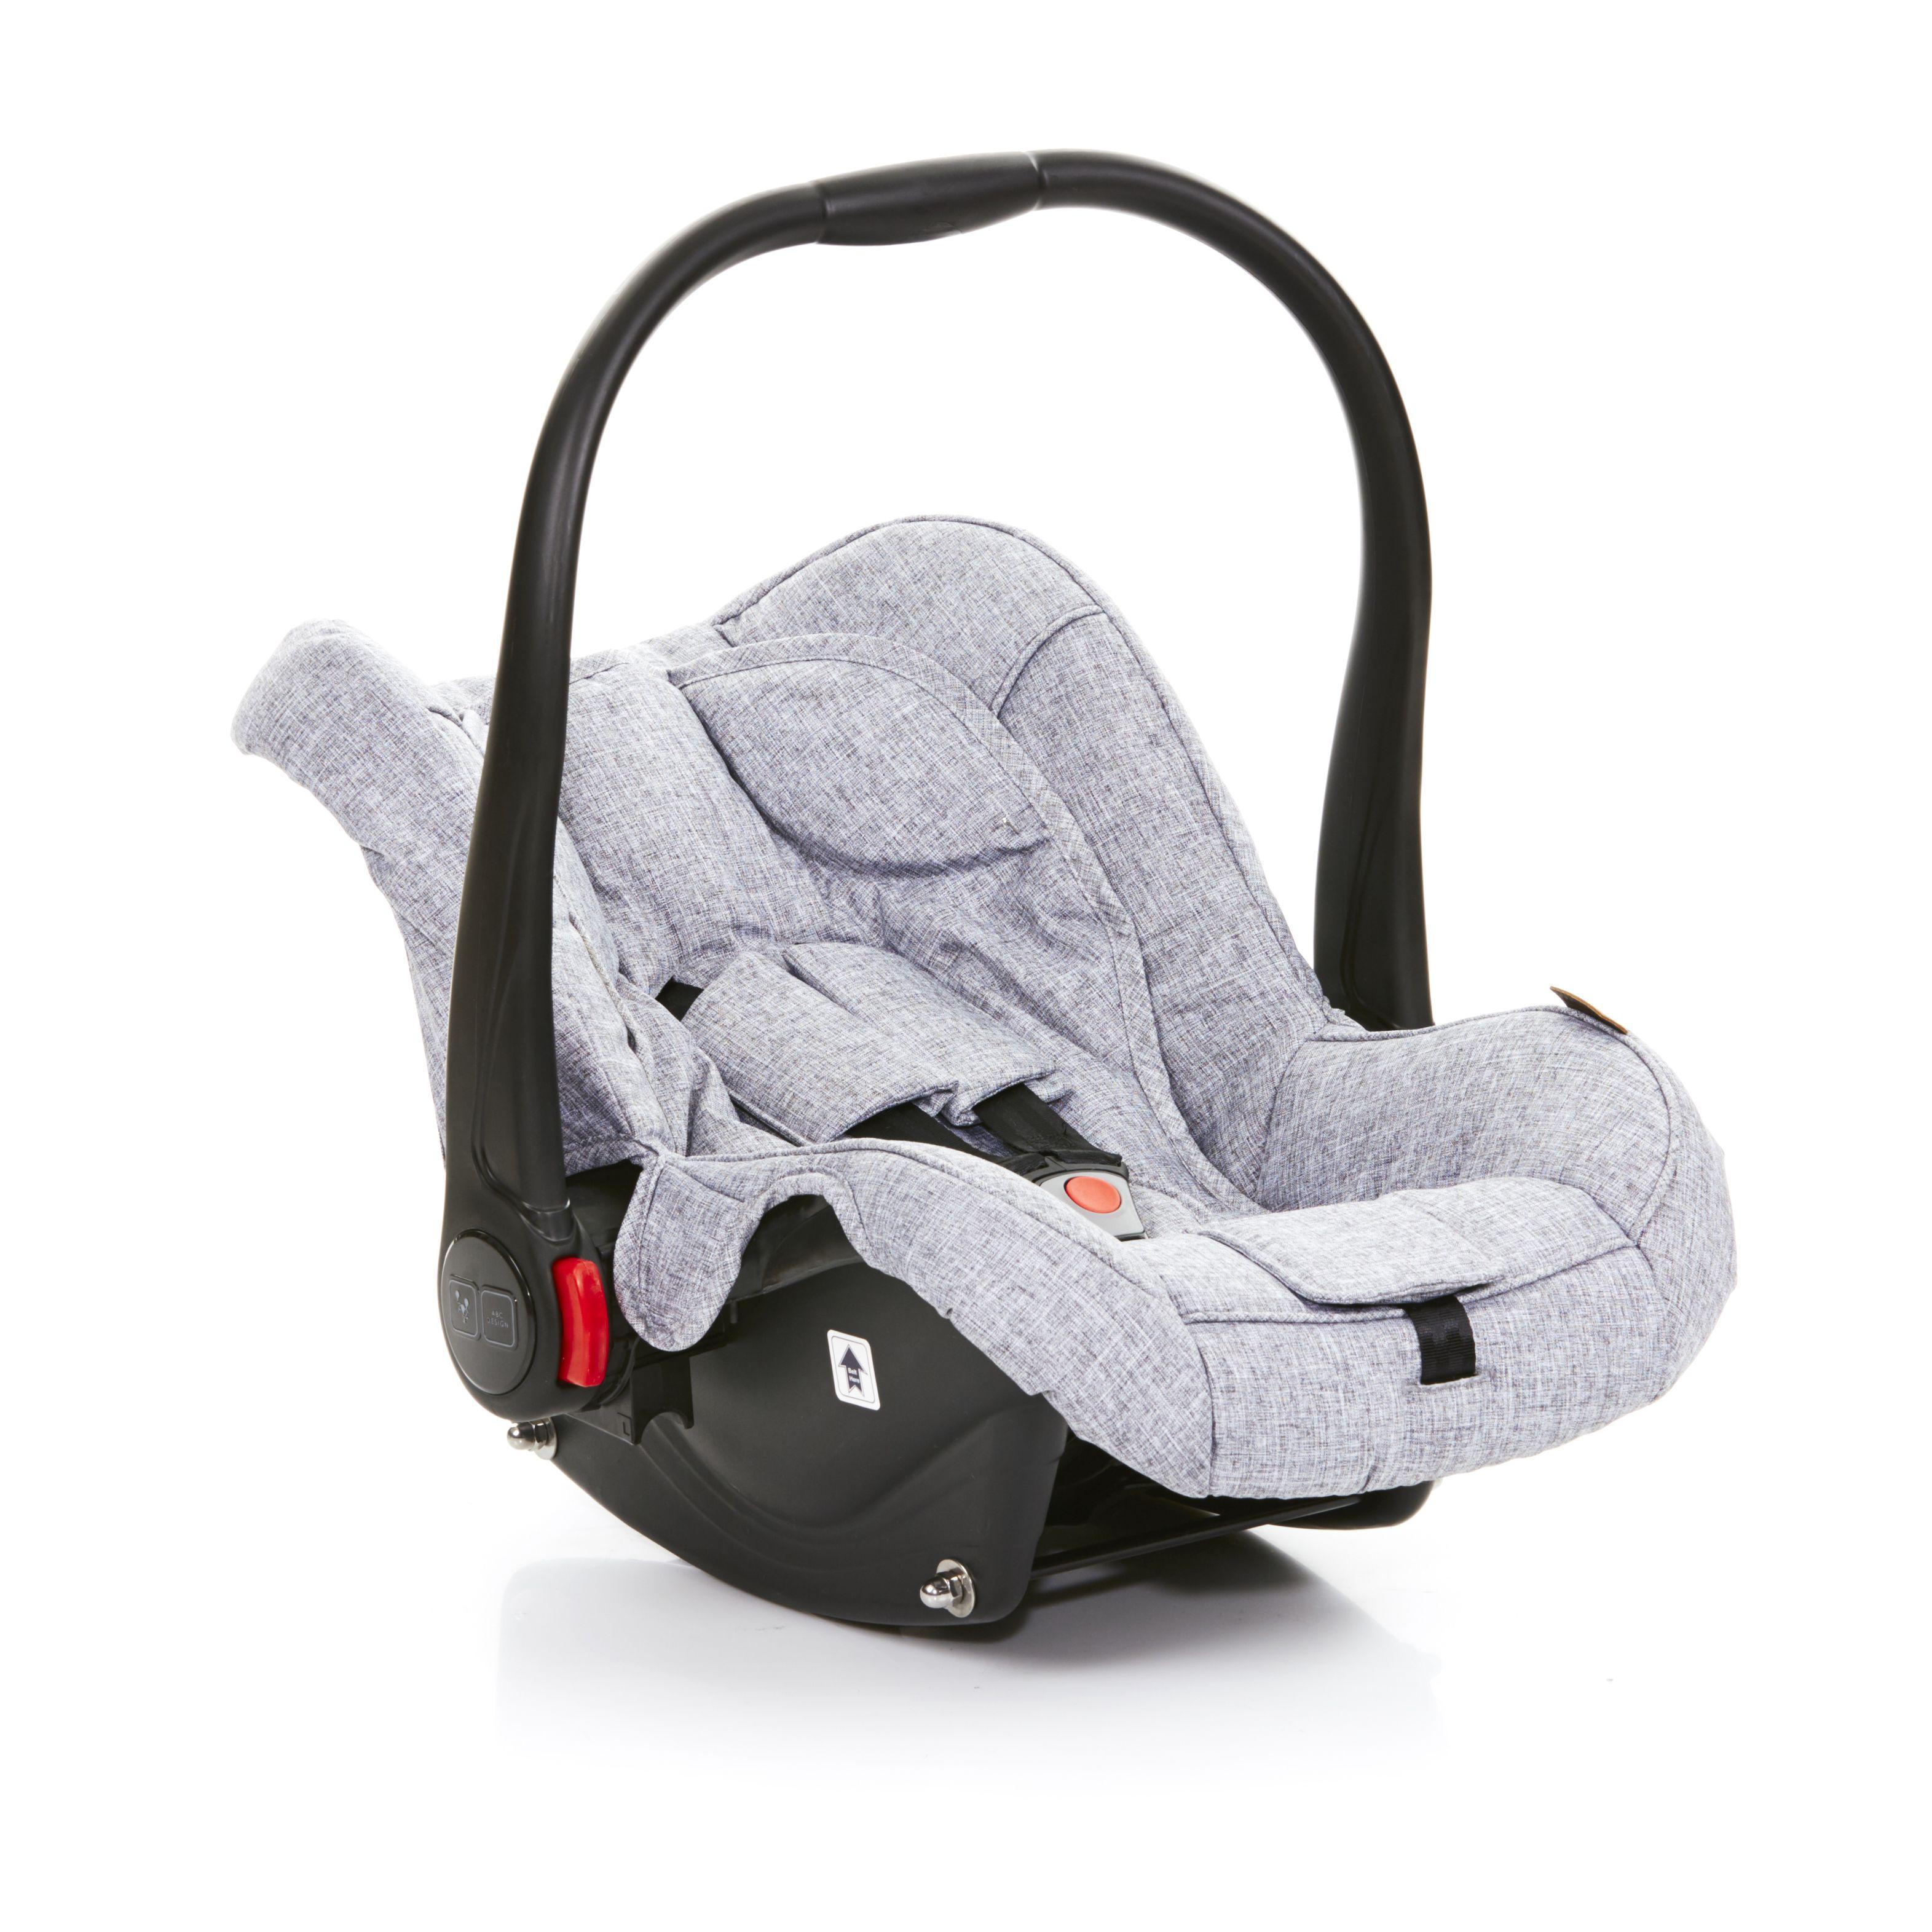 Abc Design Infant Car Seat Hazel 2018 Graphite Grey Buy At